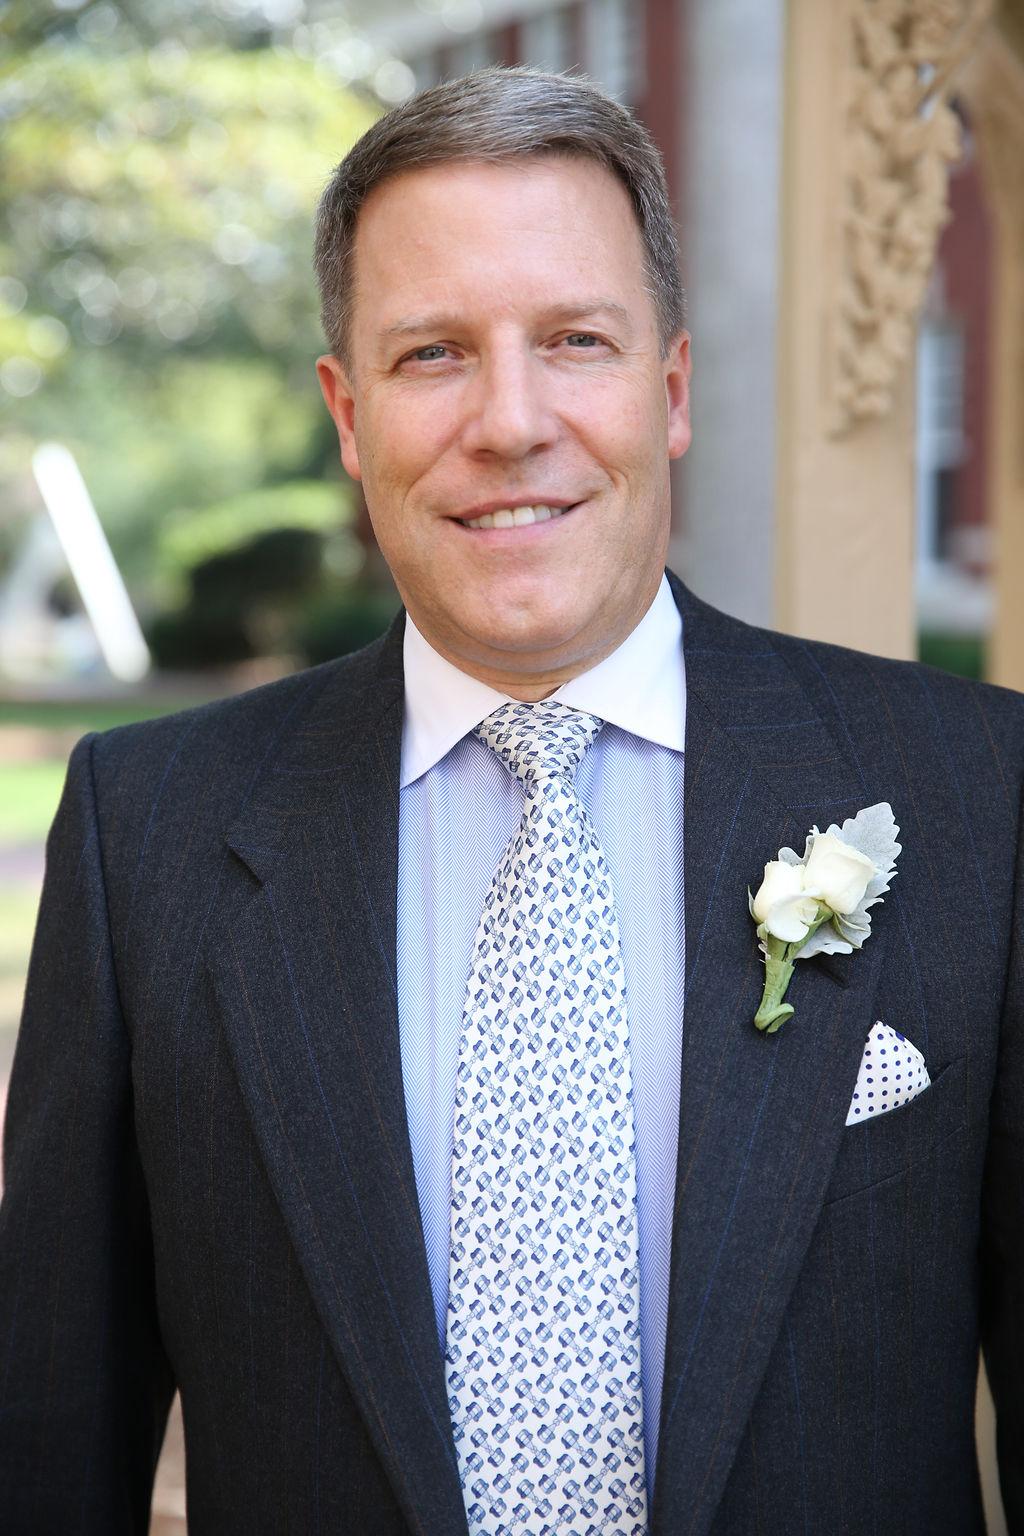 Groom prepares for her wedding at Belk Chapel wearing a dark suite and light blue shirt